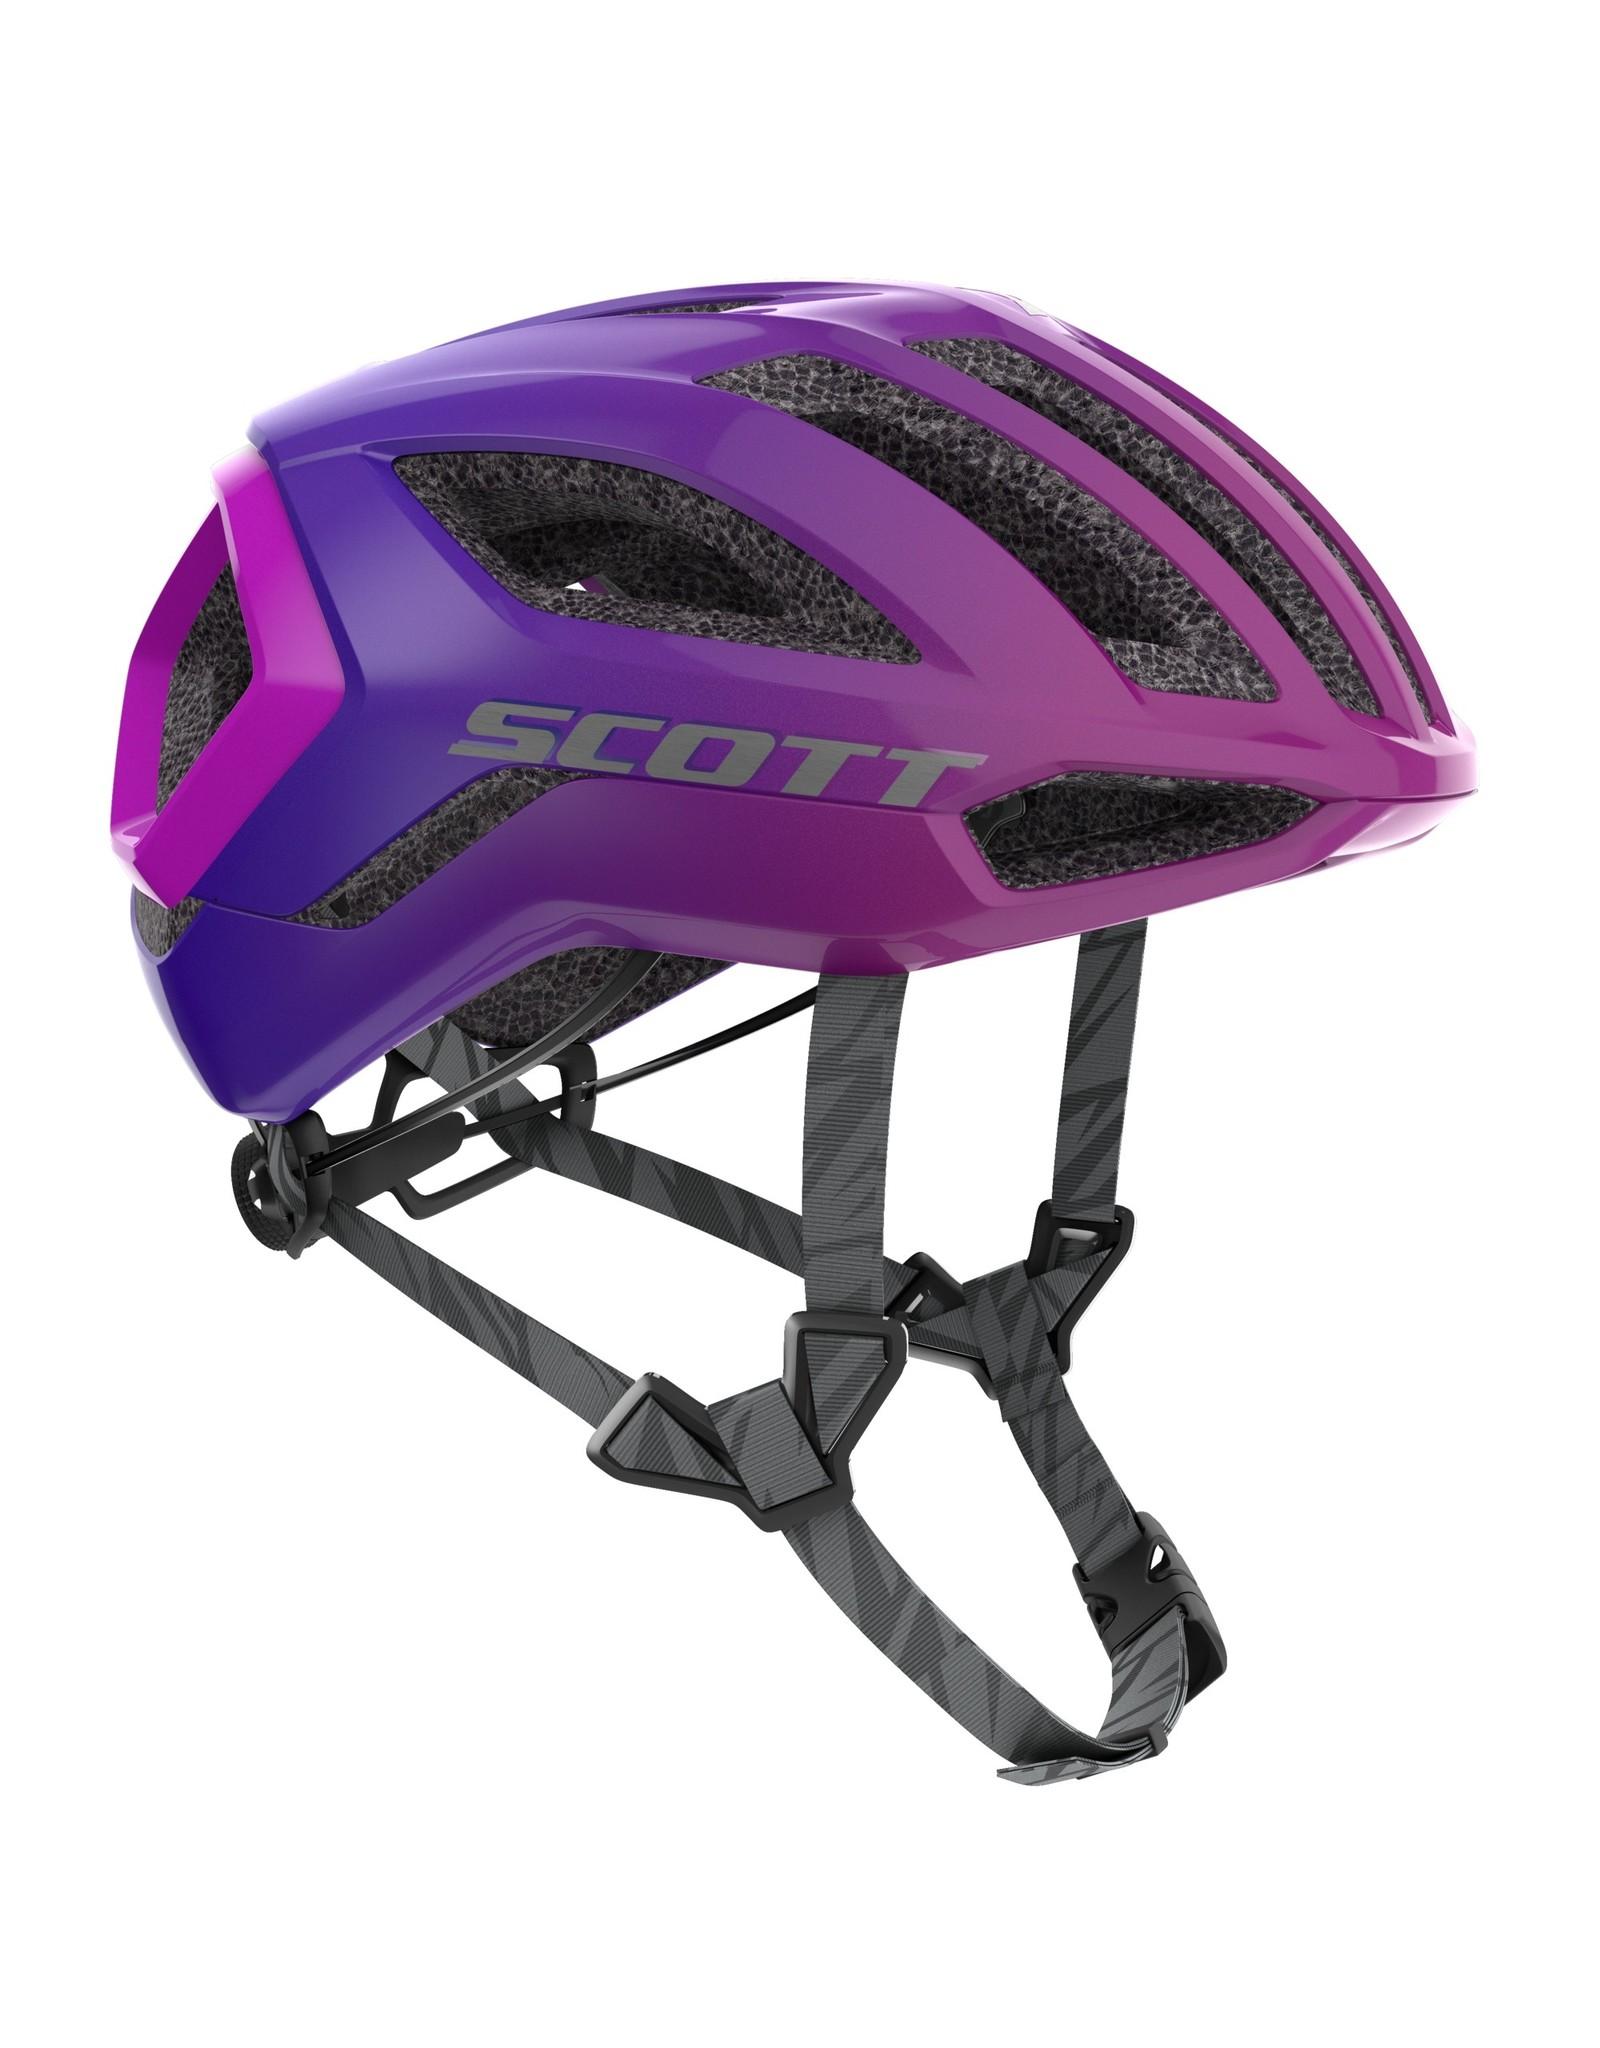 Scott '21, Scott, Helmet, Centric Plus, Supersonic Ltd Edition,